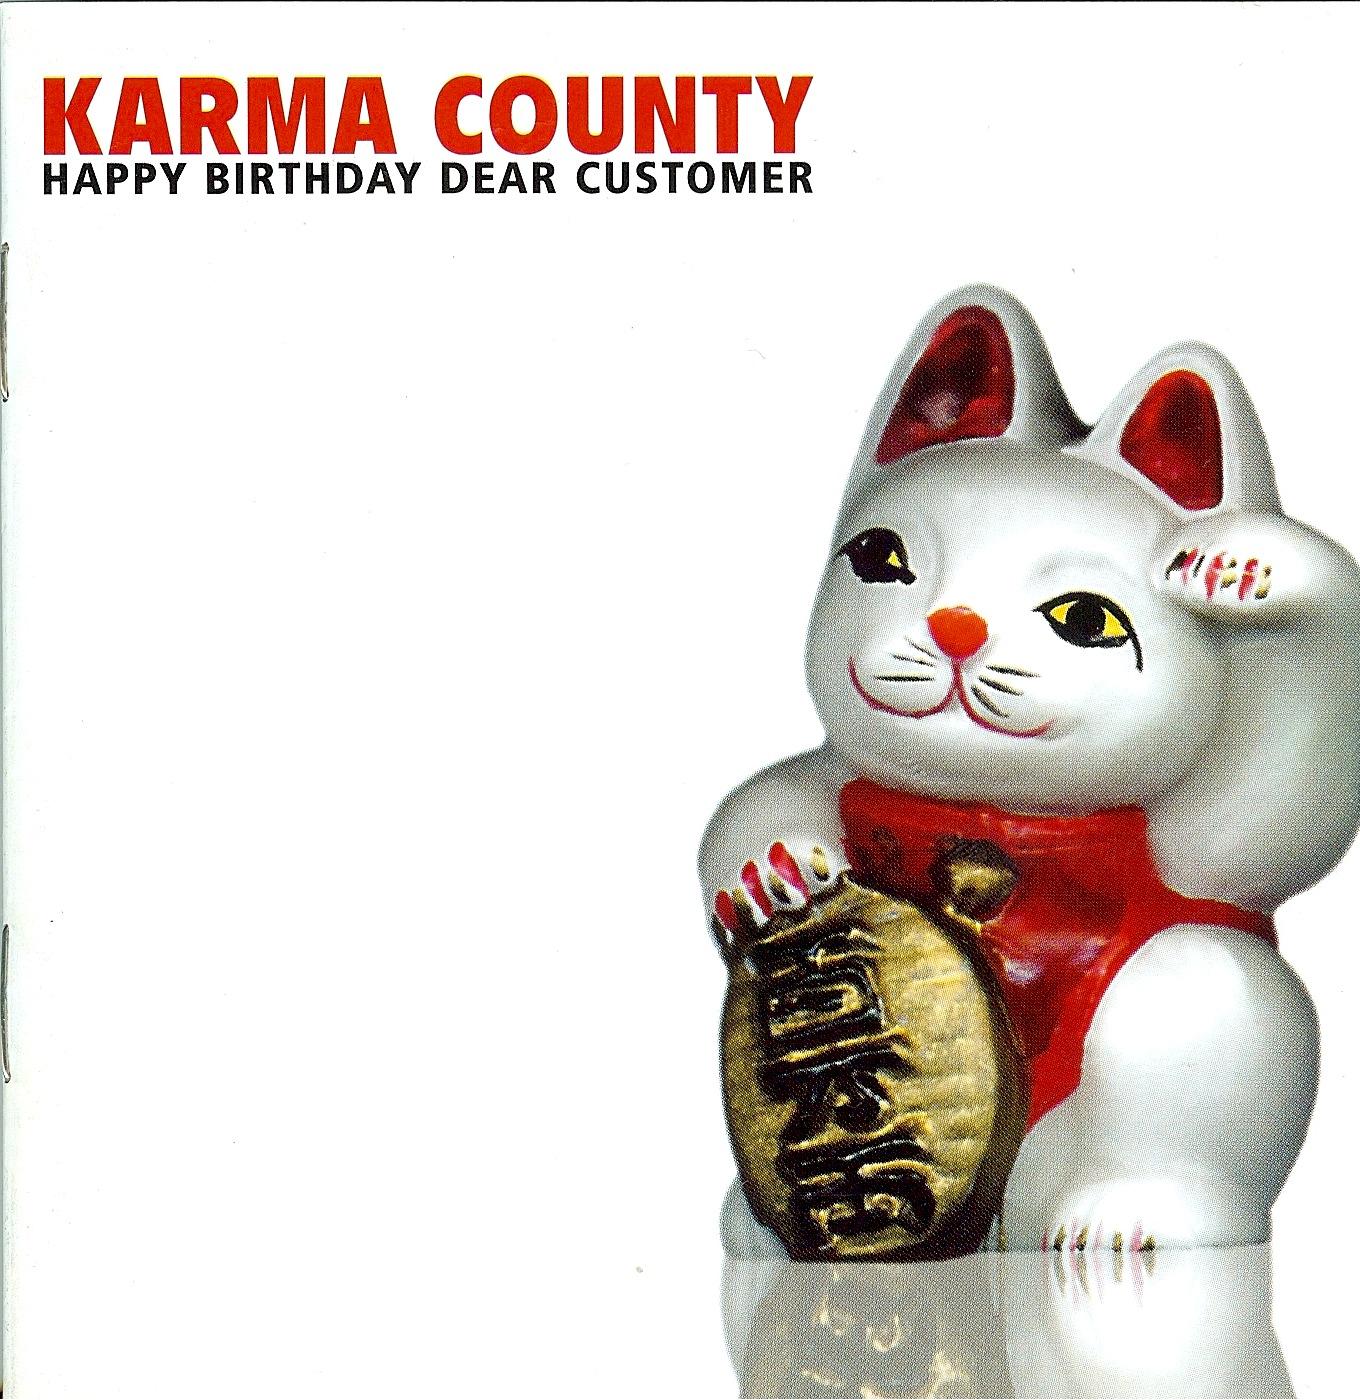 KarmaCounty_HappyBirthdayDearCustomer.jpeg